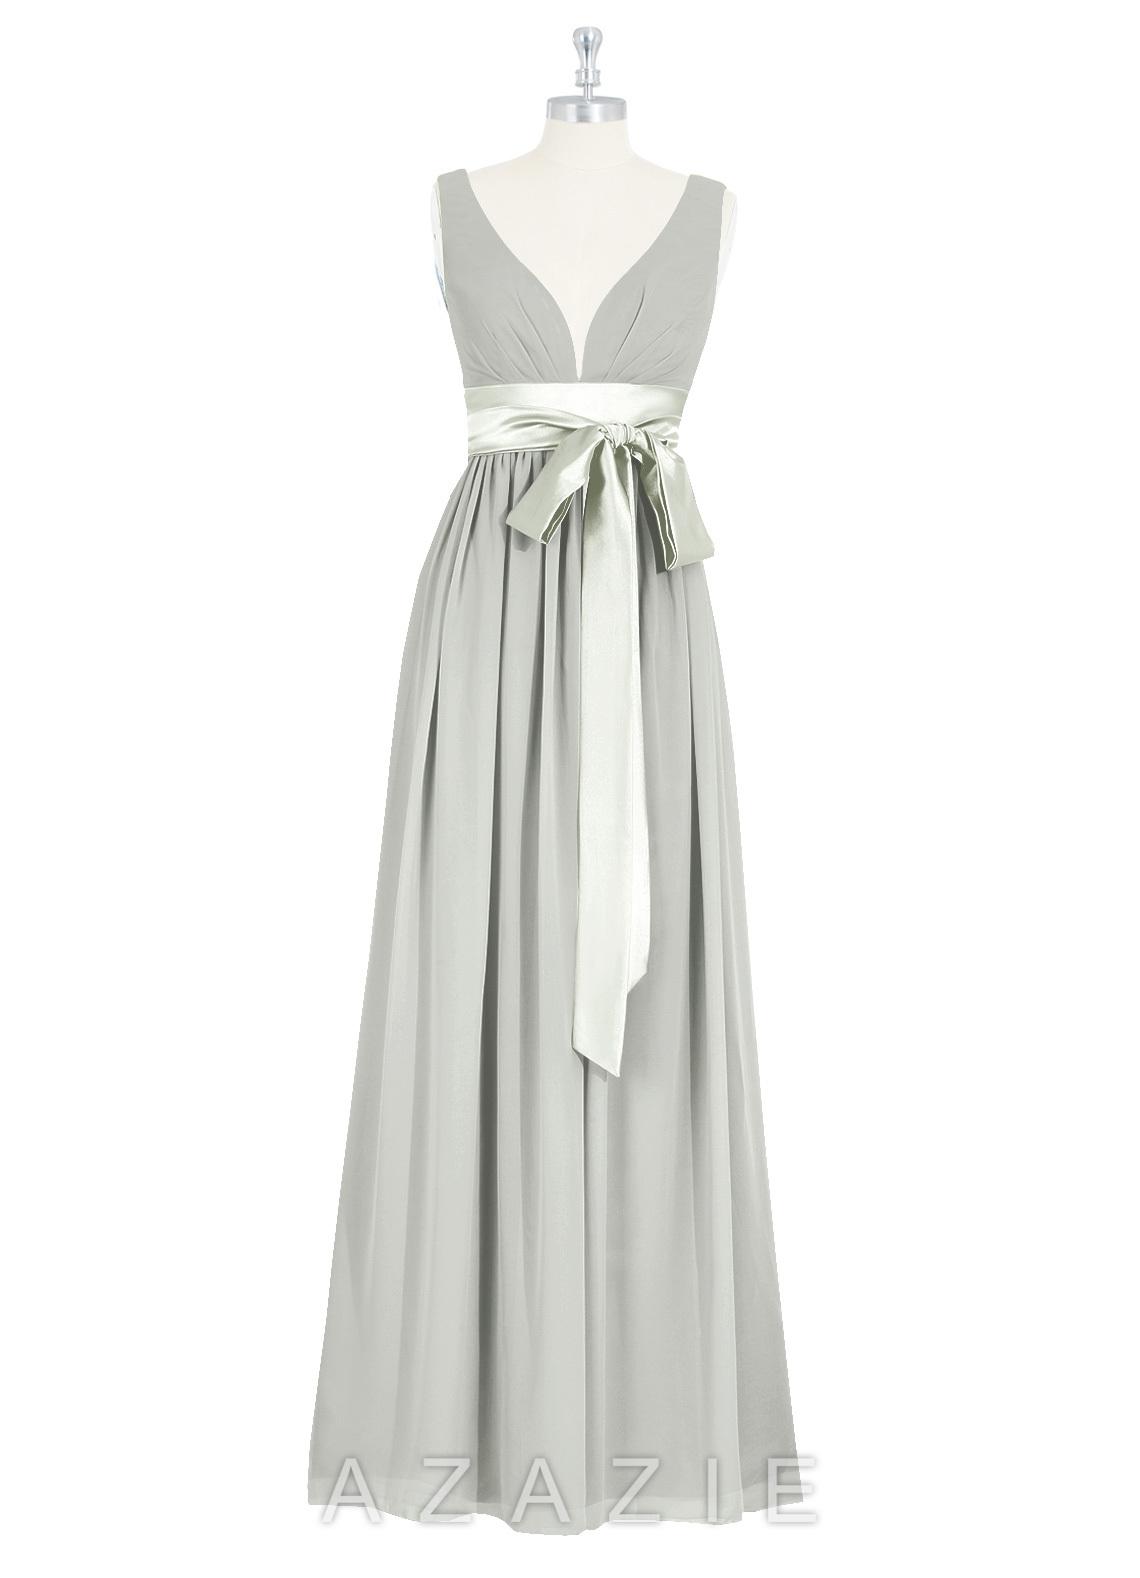 Azazie georgia bridesmaid dress azazie color silver ombrellifo Gallery